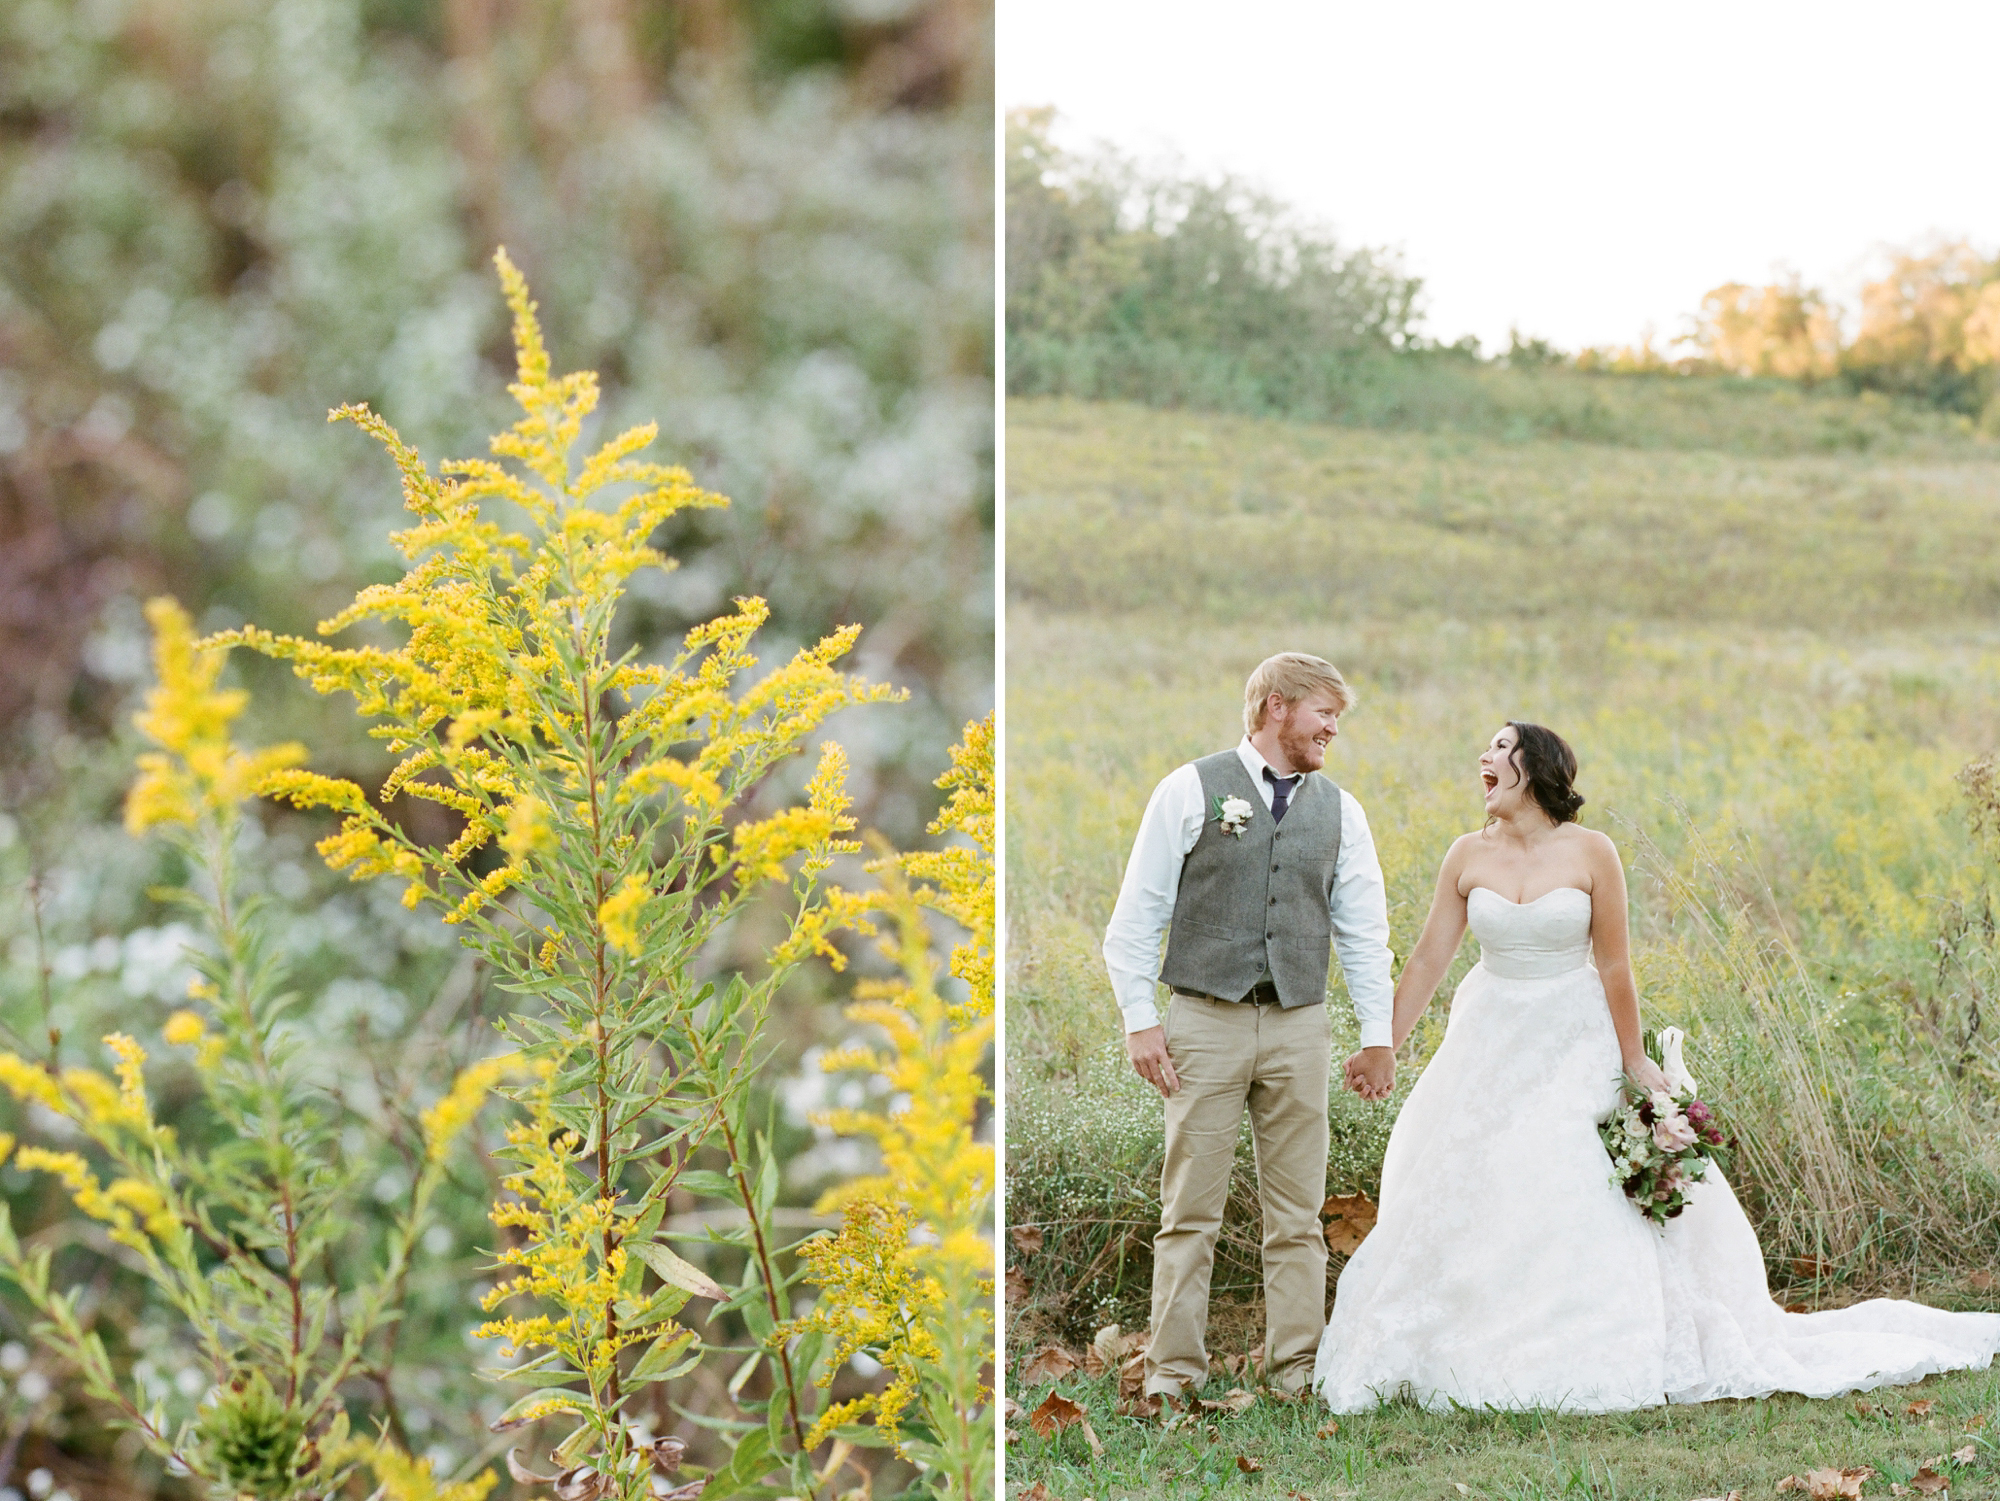 southern-weddings-film-photographer_0050